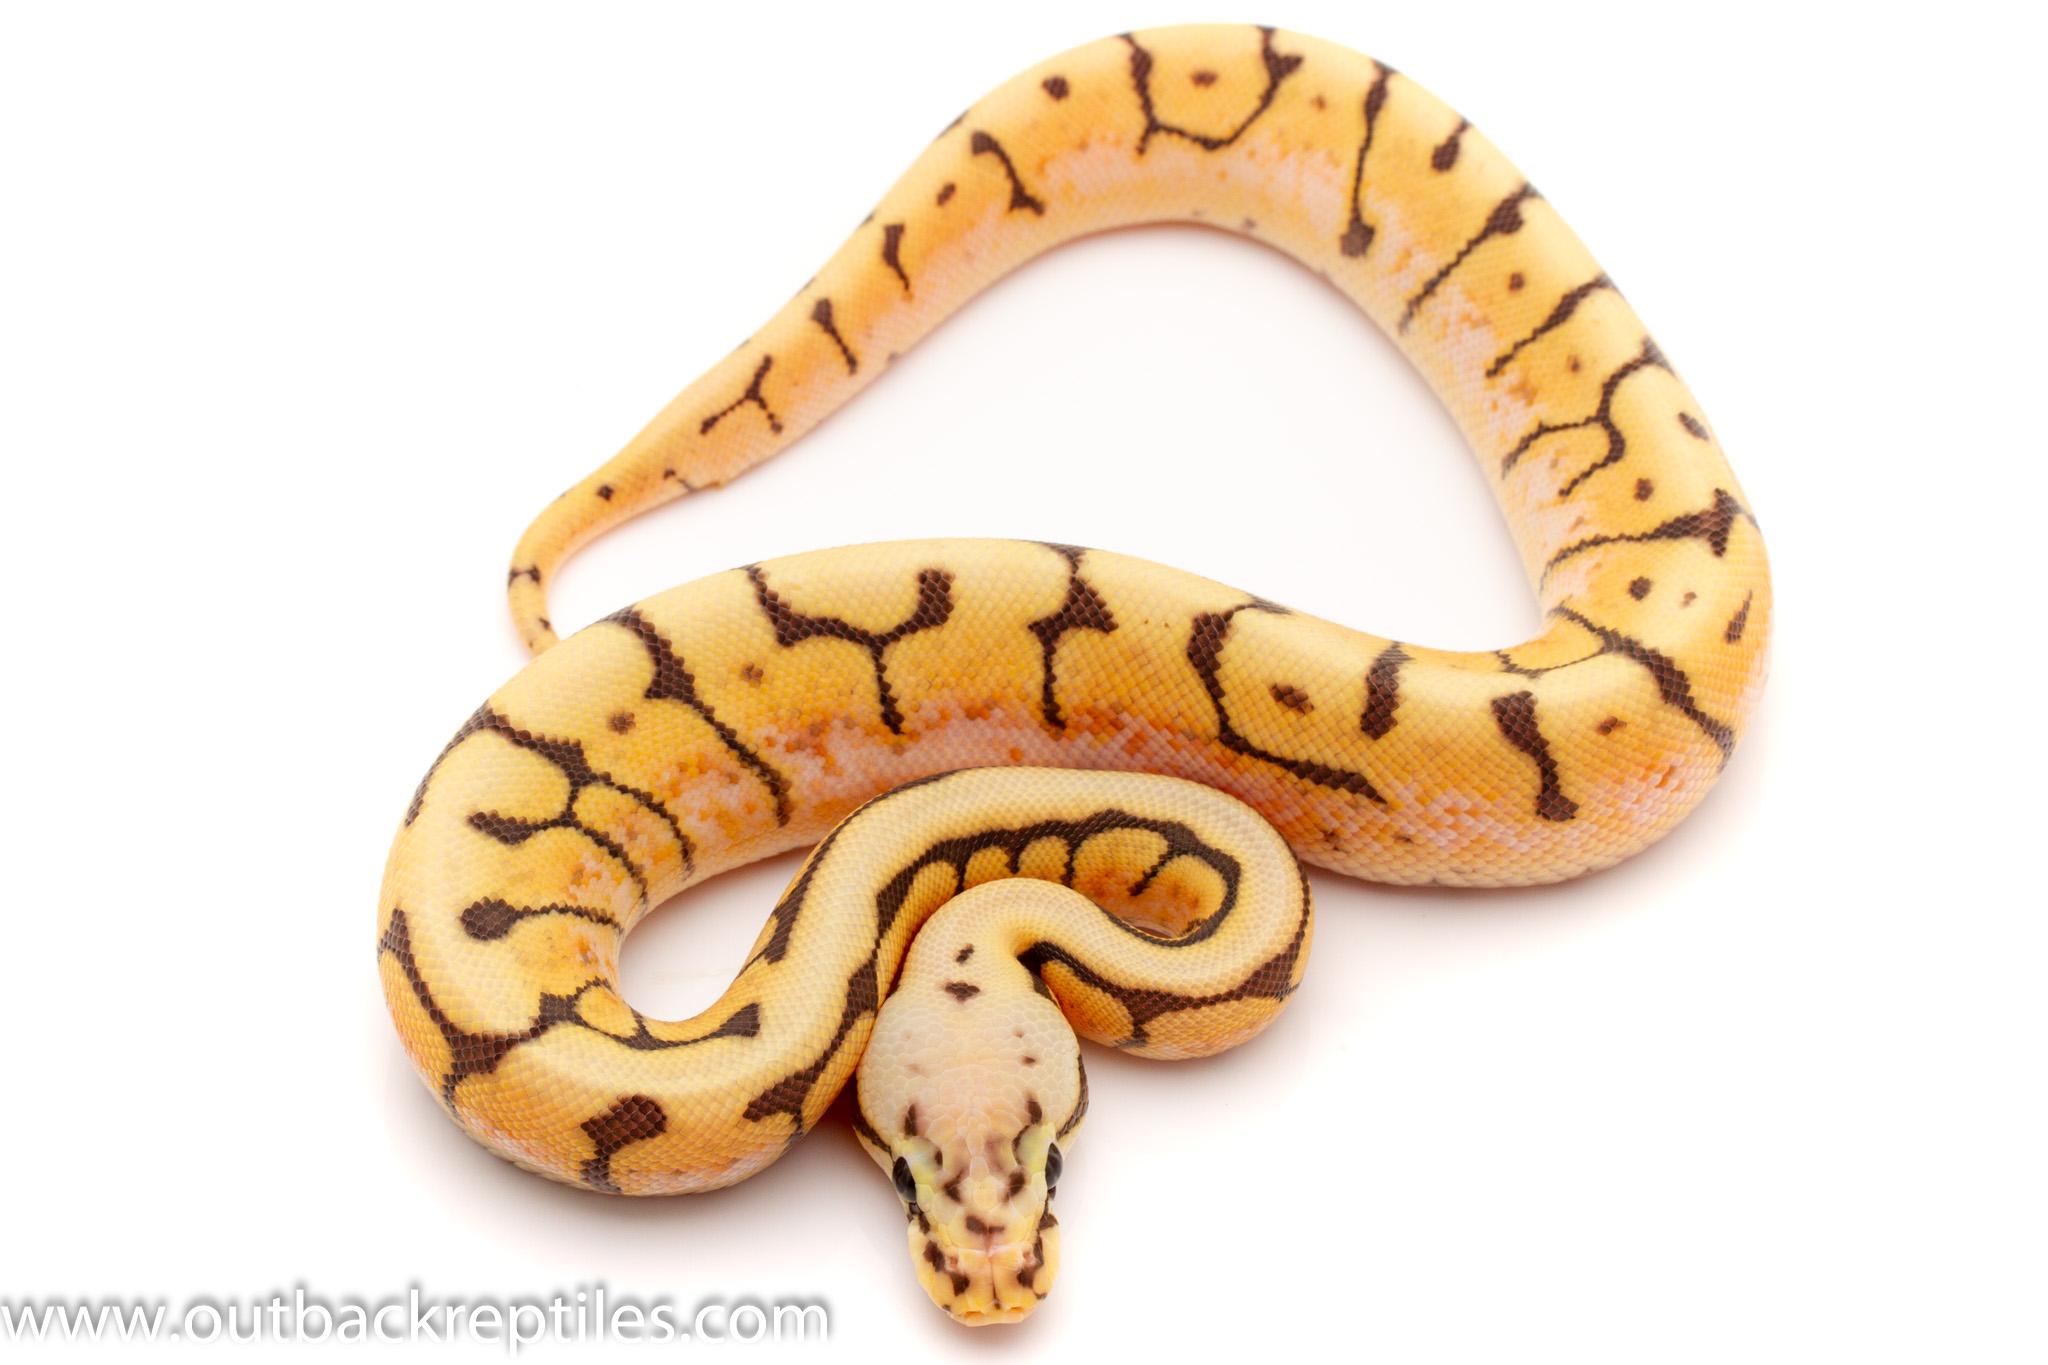 killer bee enchi ghost ball python for sale